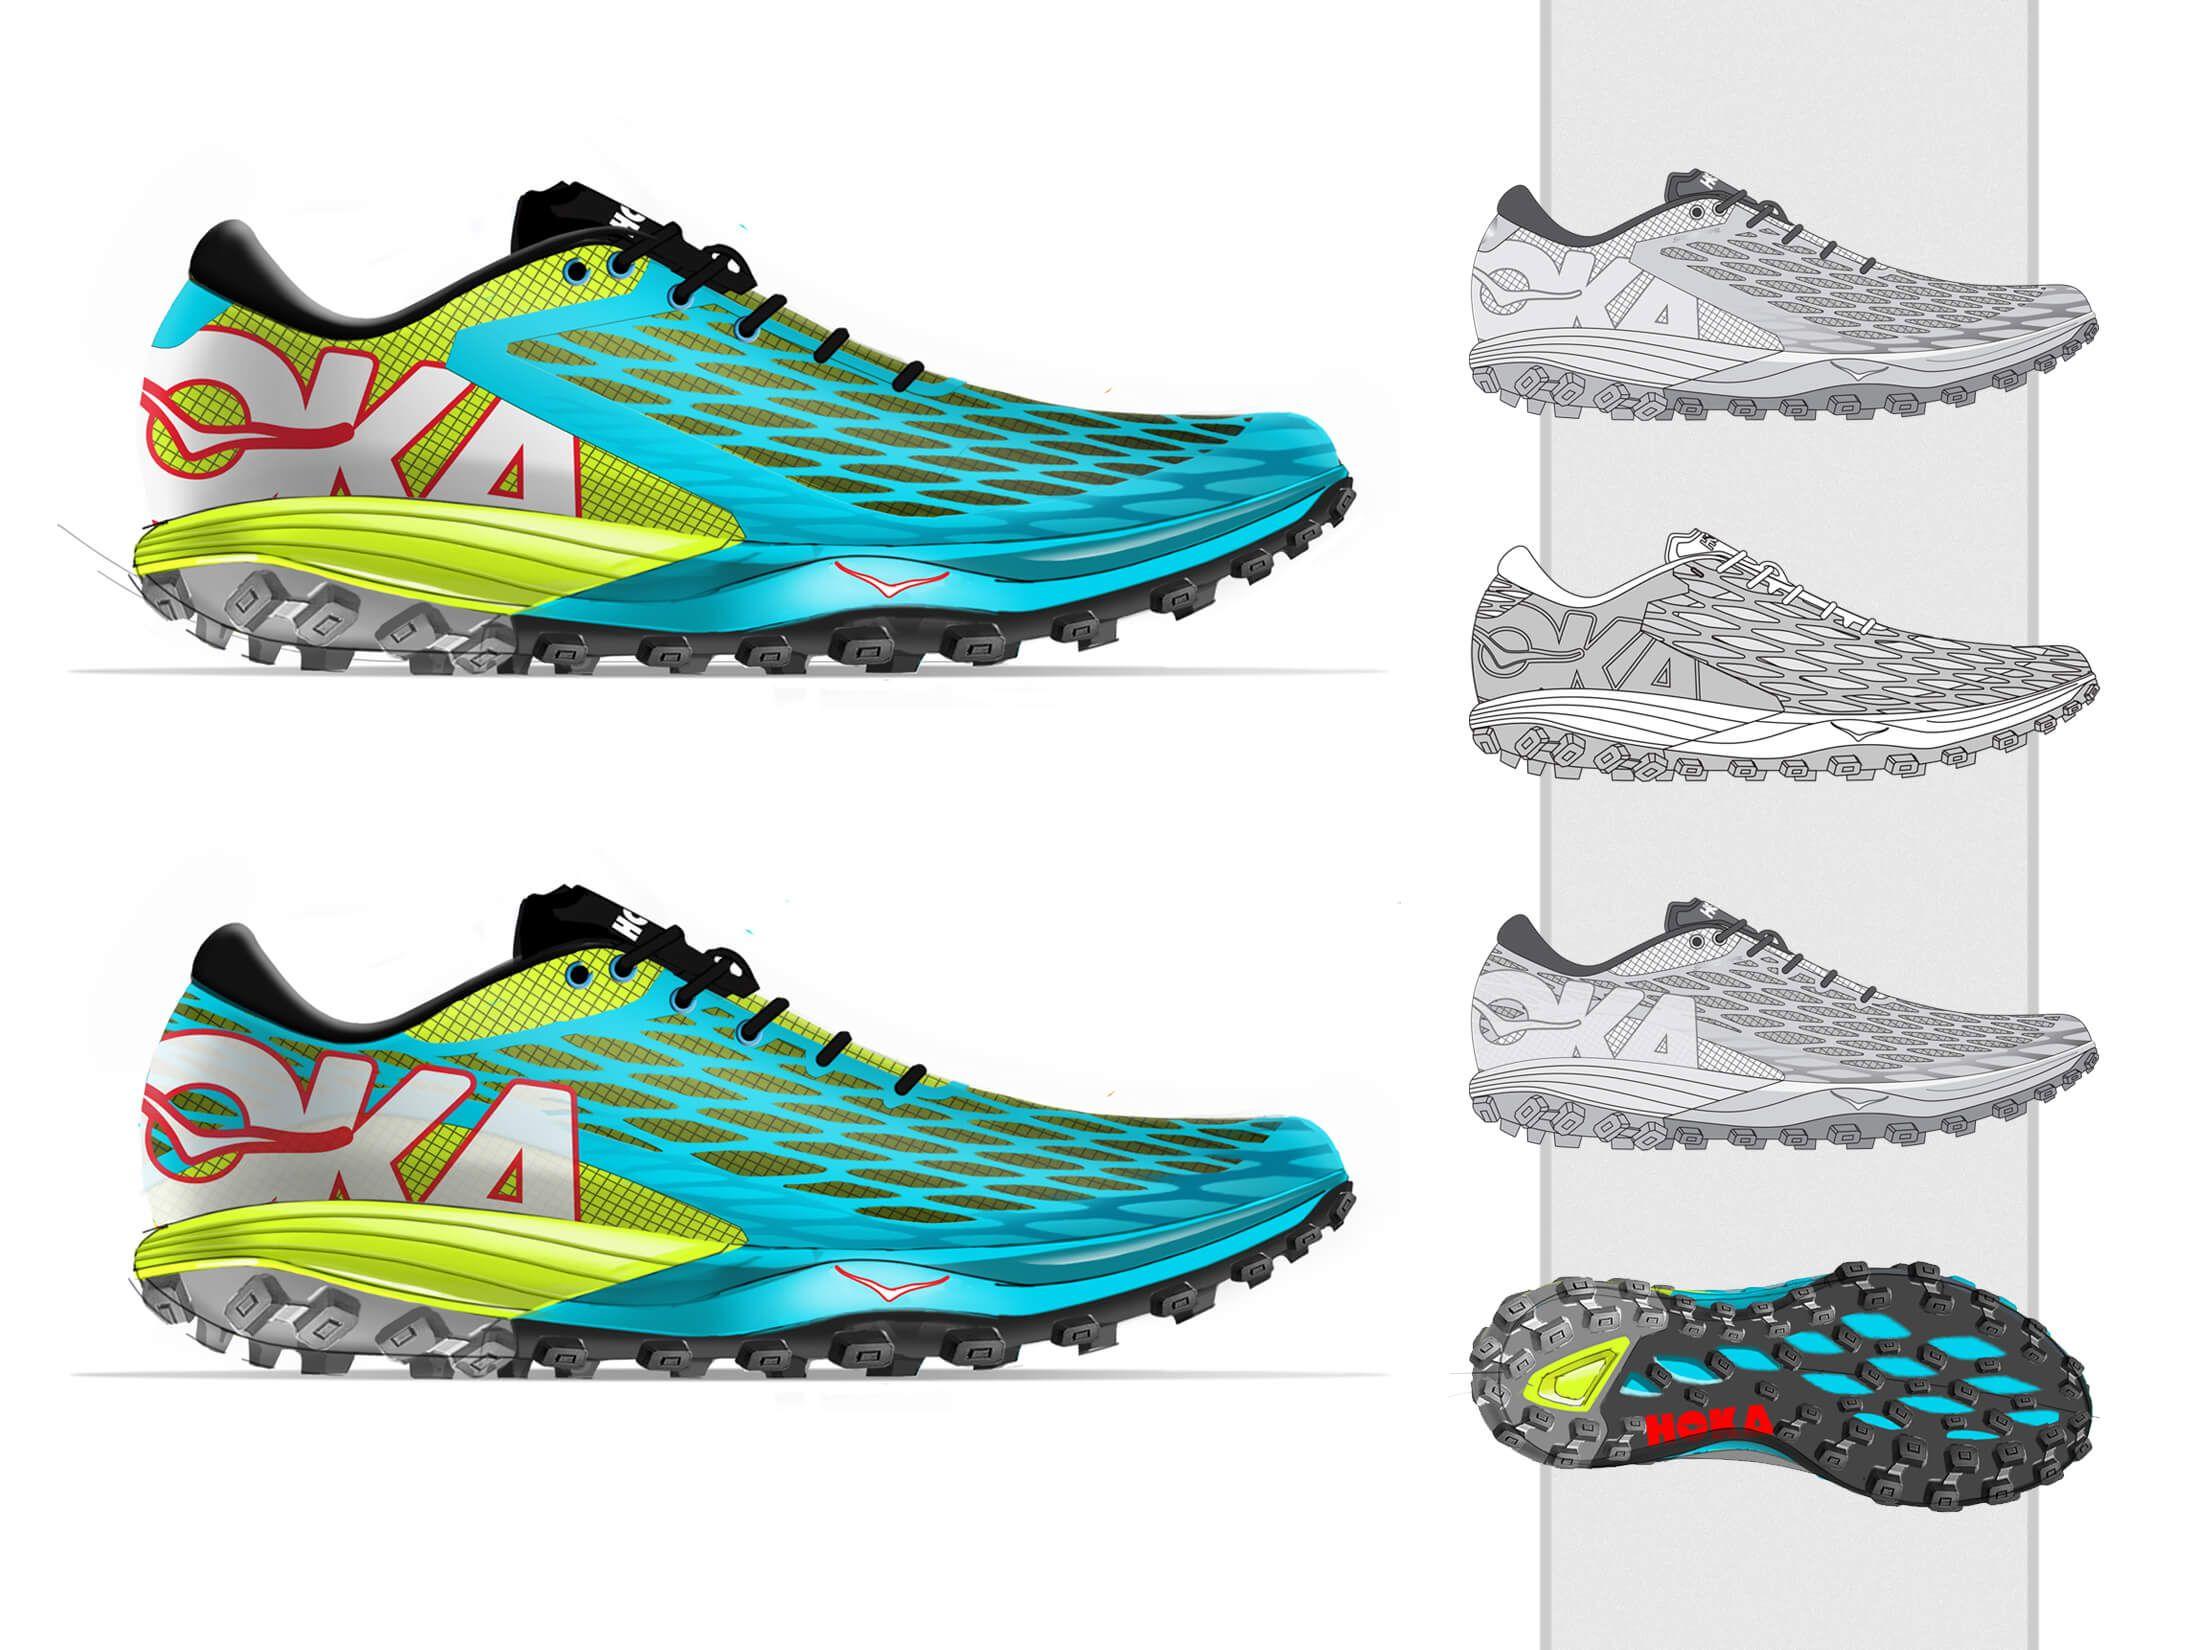 Speed Instinct   GHOST WORKS   Shoe